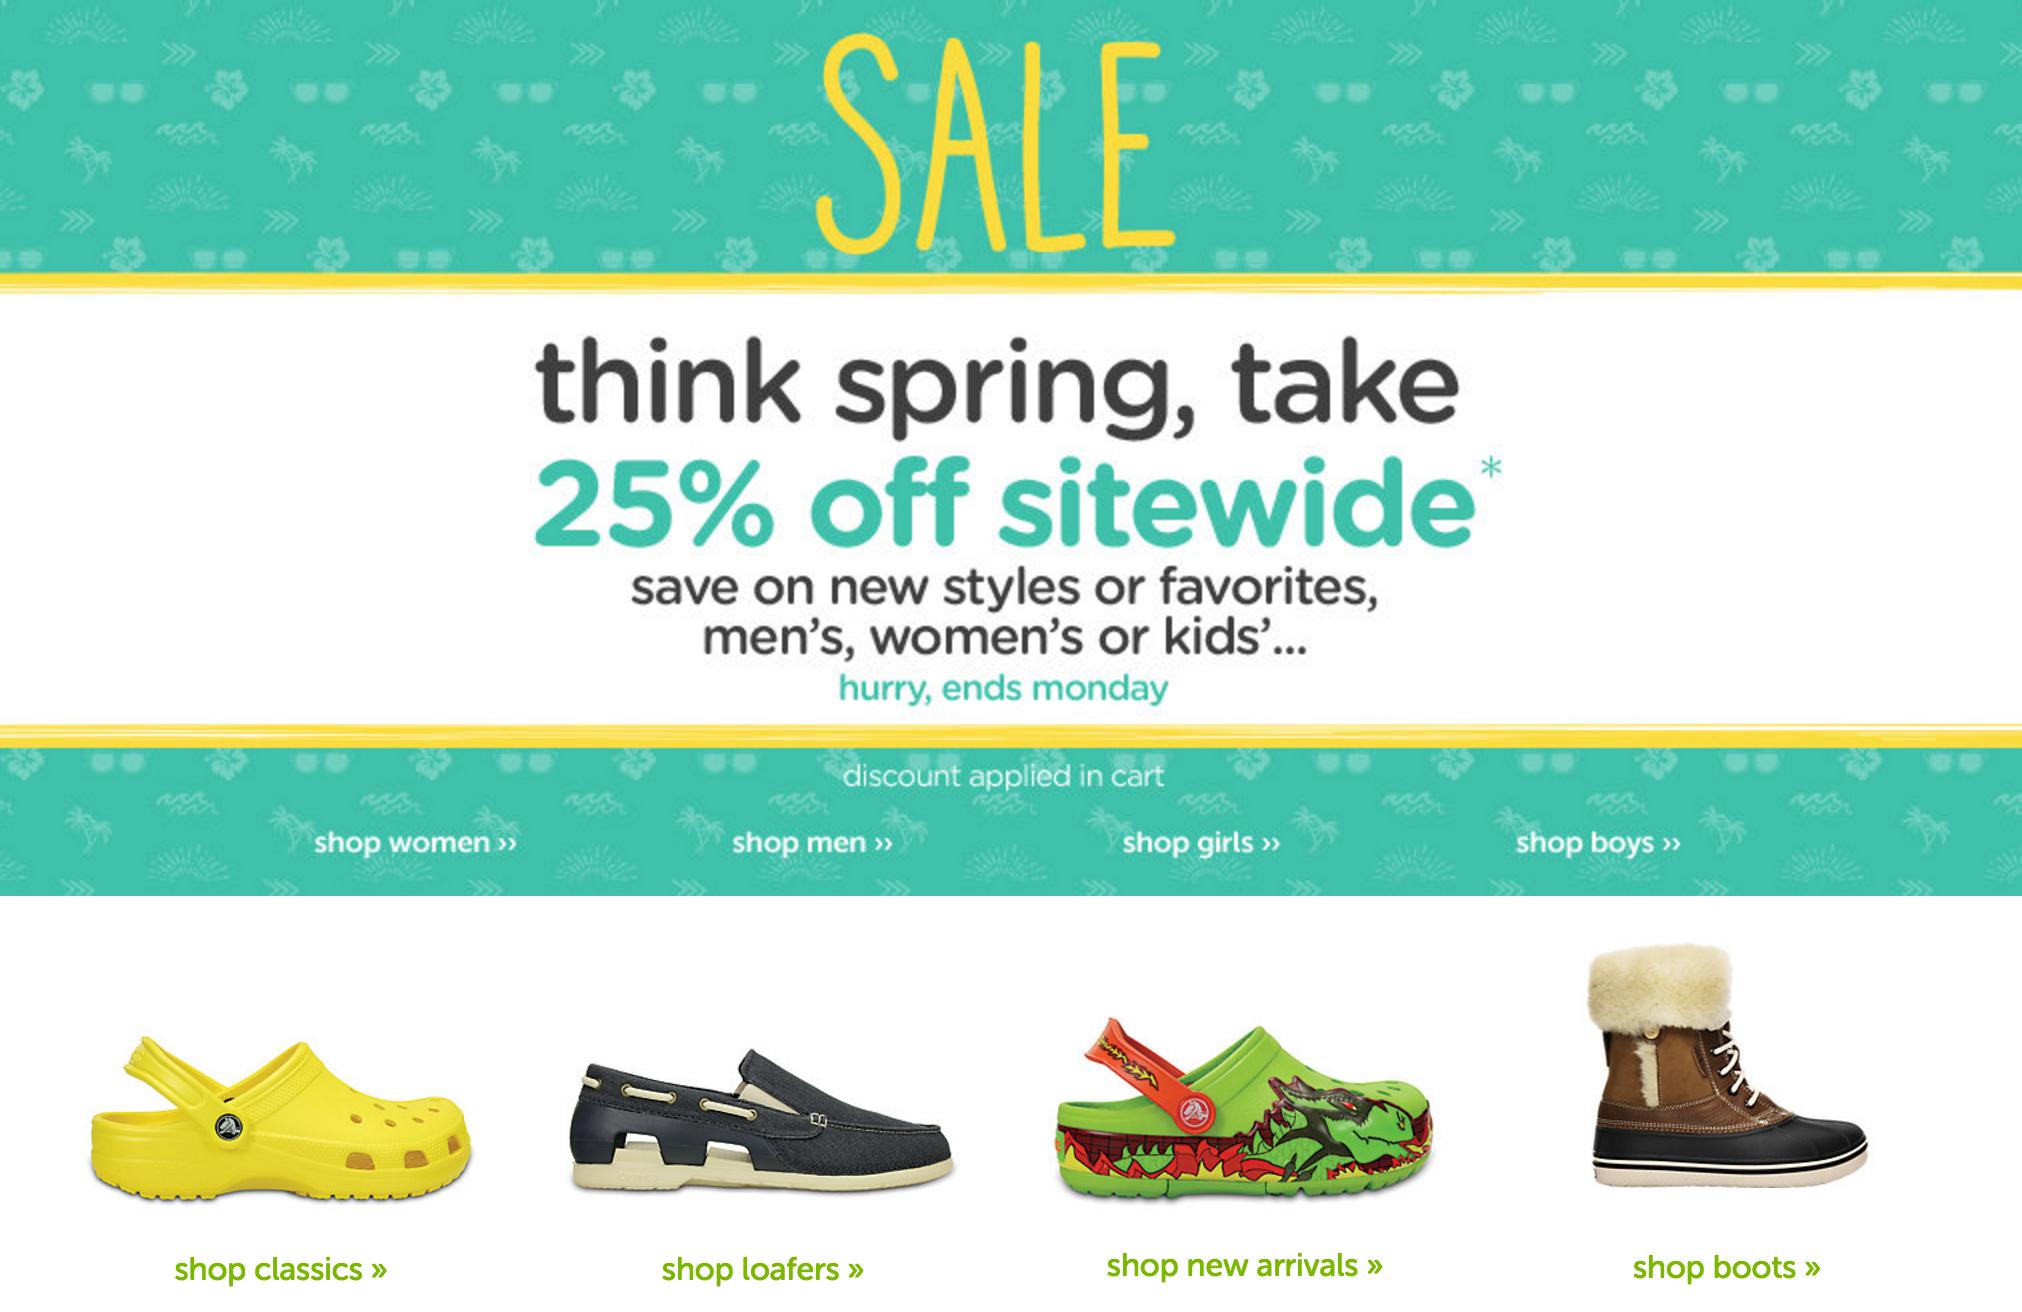 Crocs.com: 25% Off Sitewide